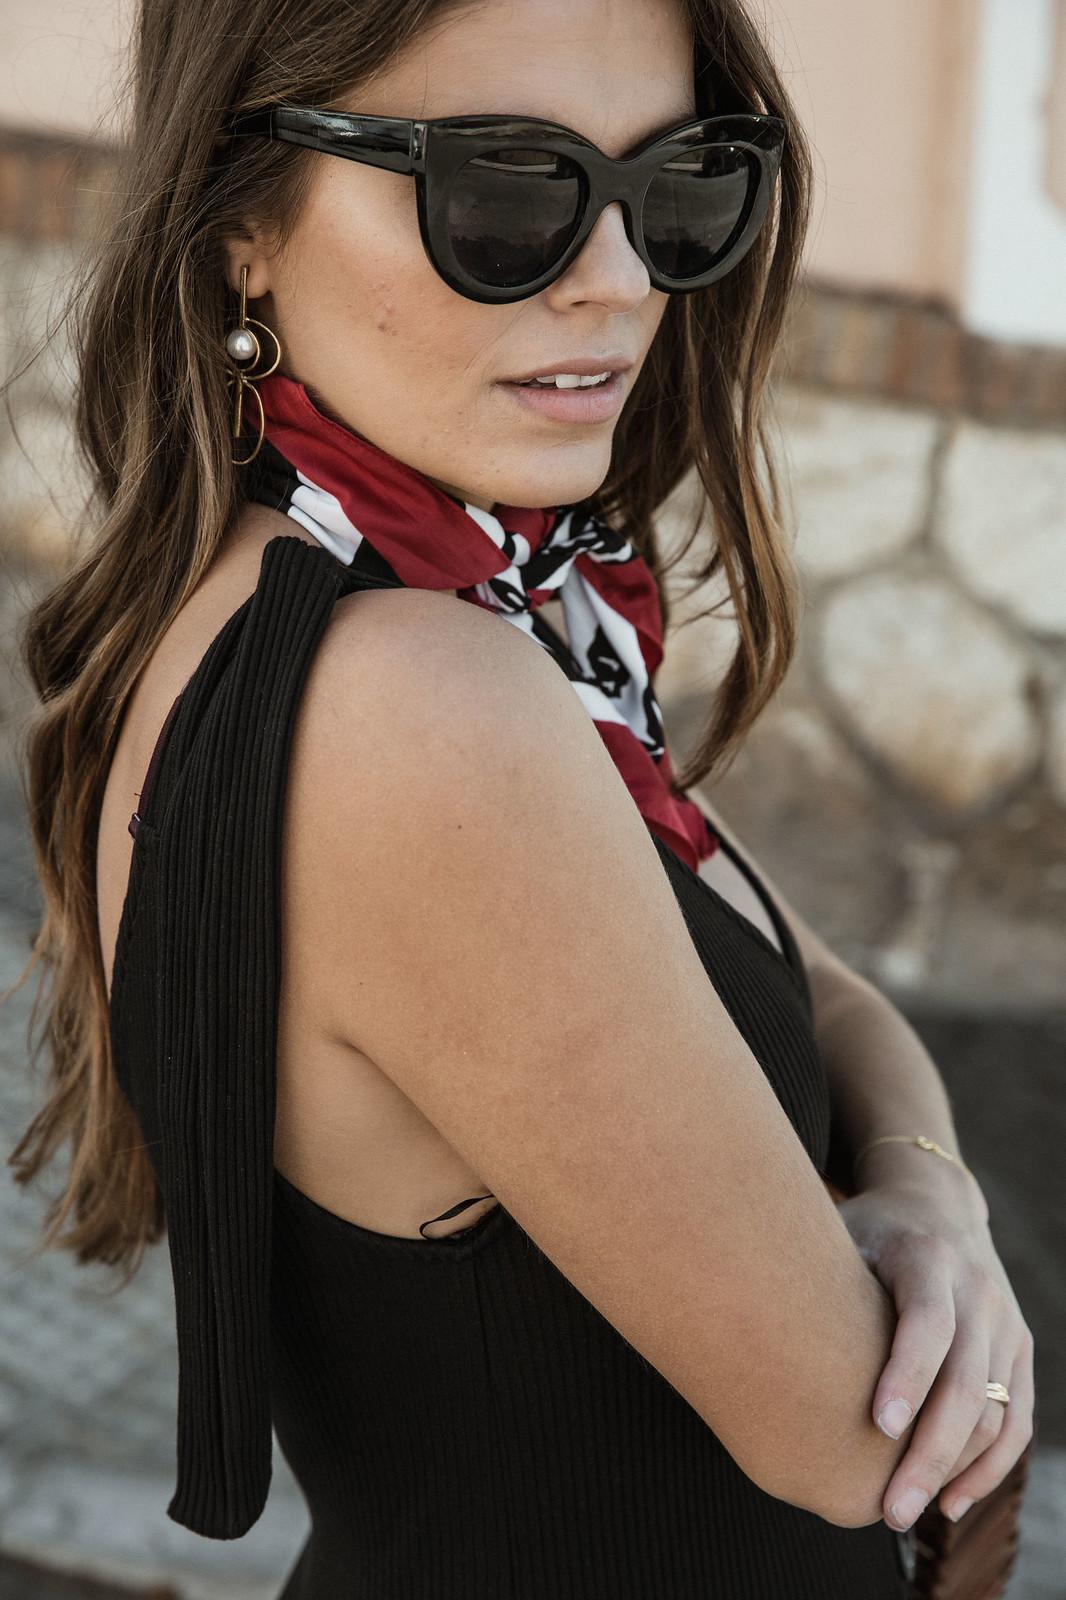 seams for a desire - jessie chanes - black tight dress - zara-13